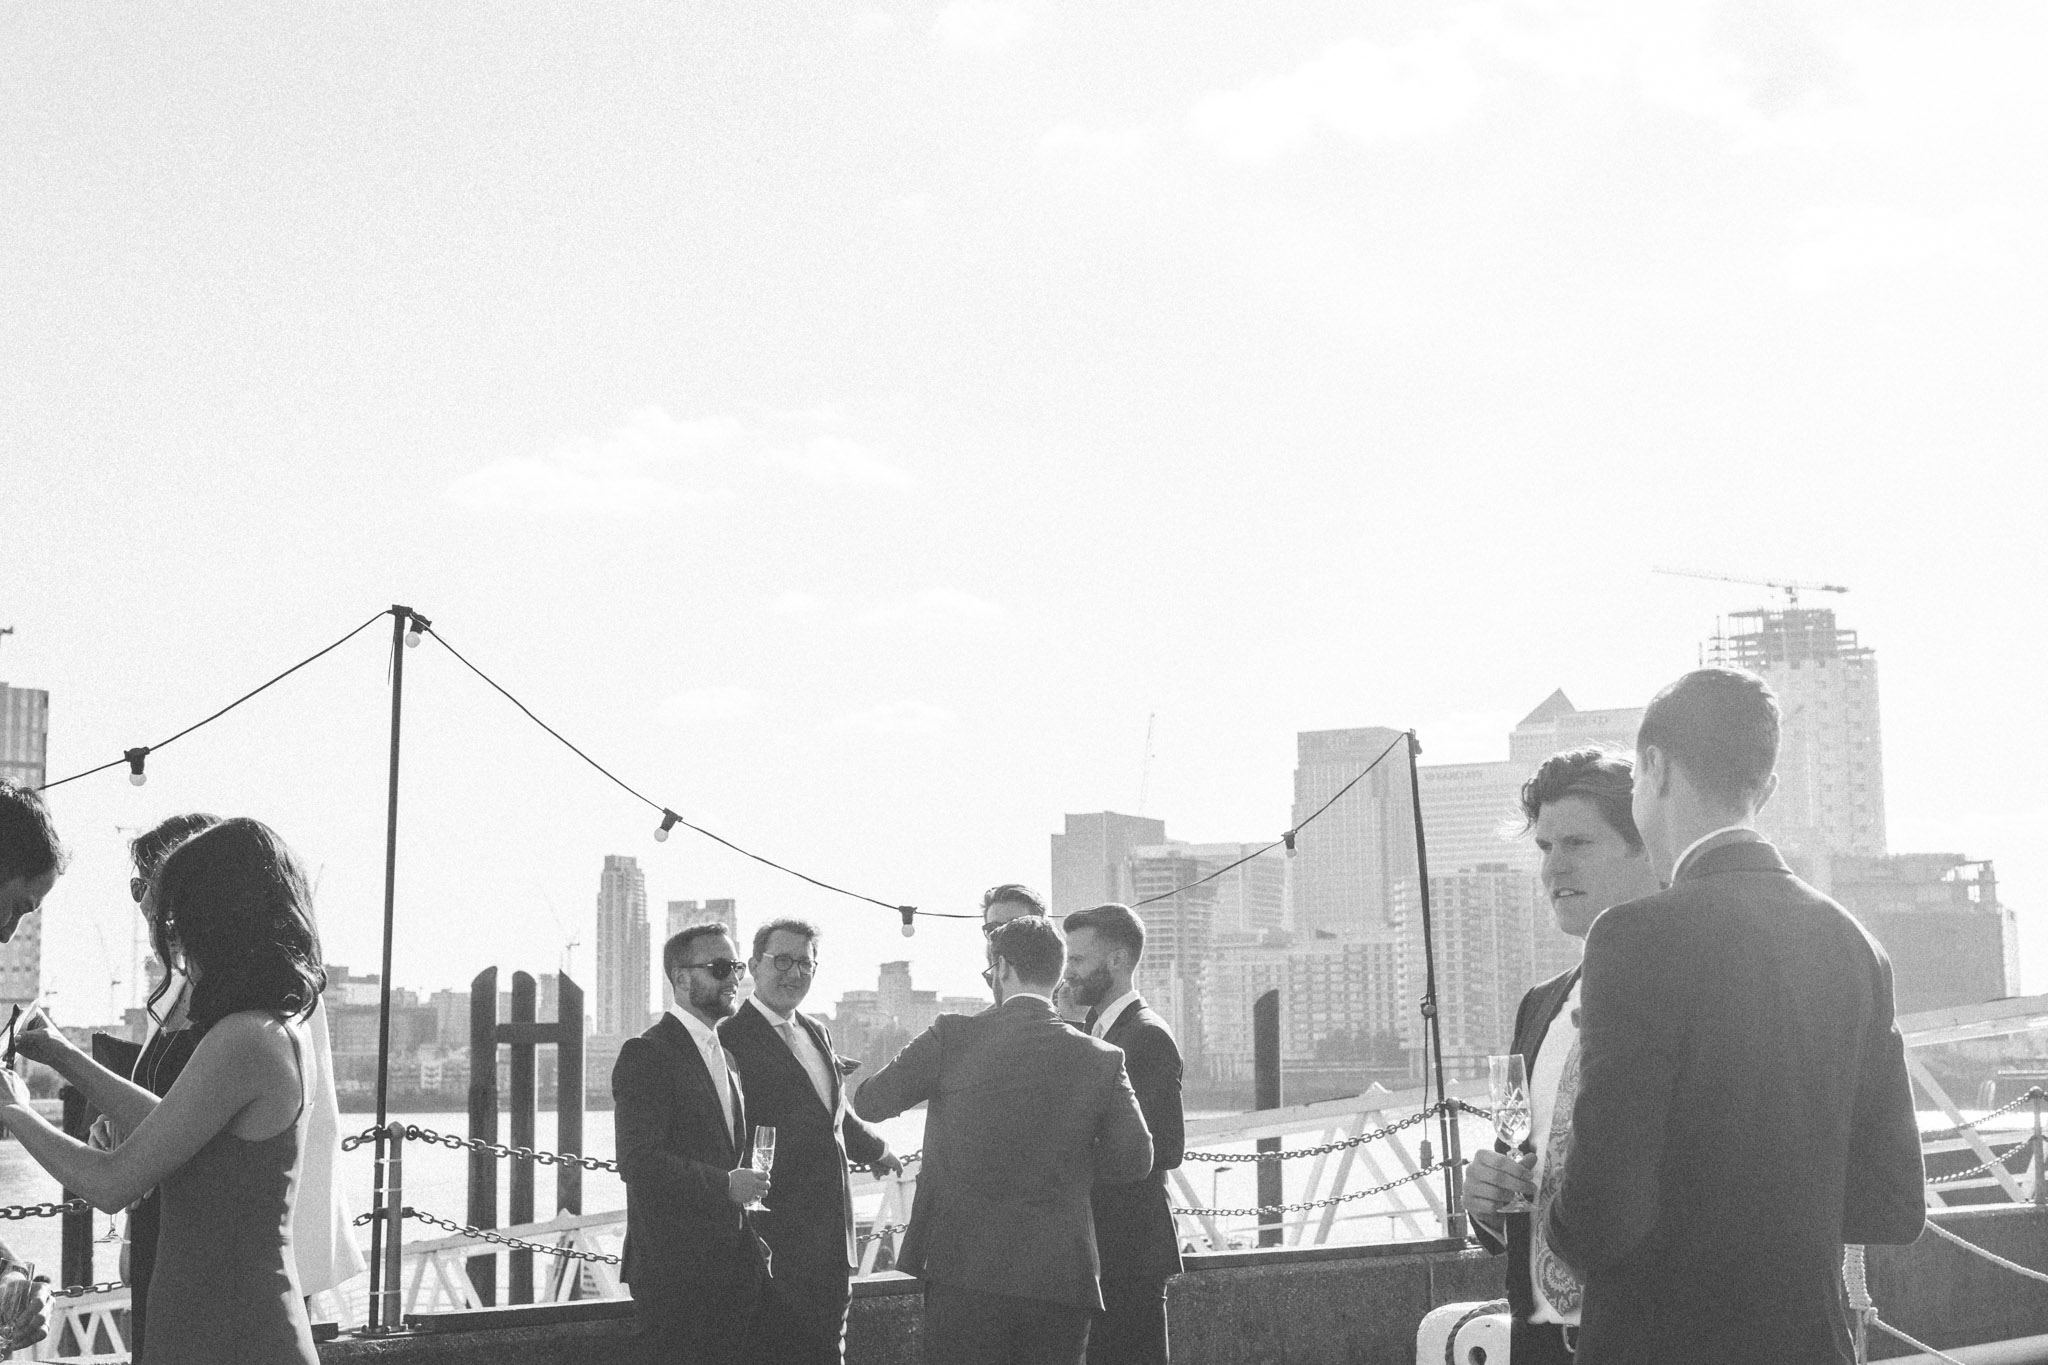 trinity_buoy_wharf_hackney_town_hall_wedding_411.jpg